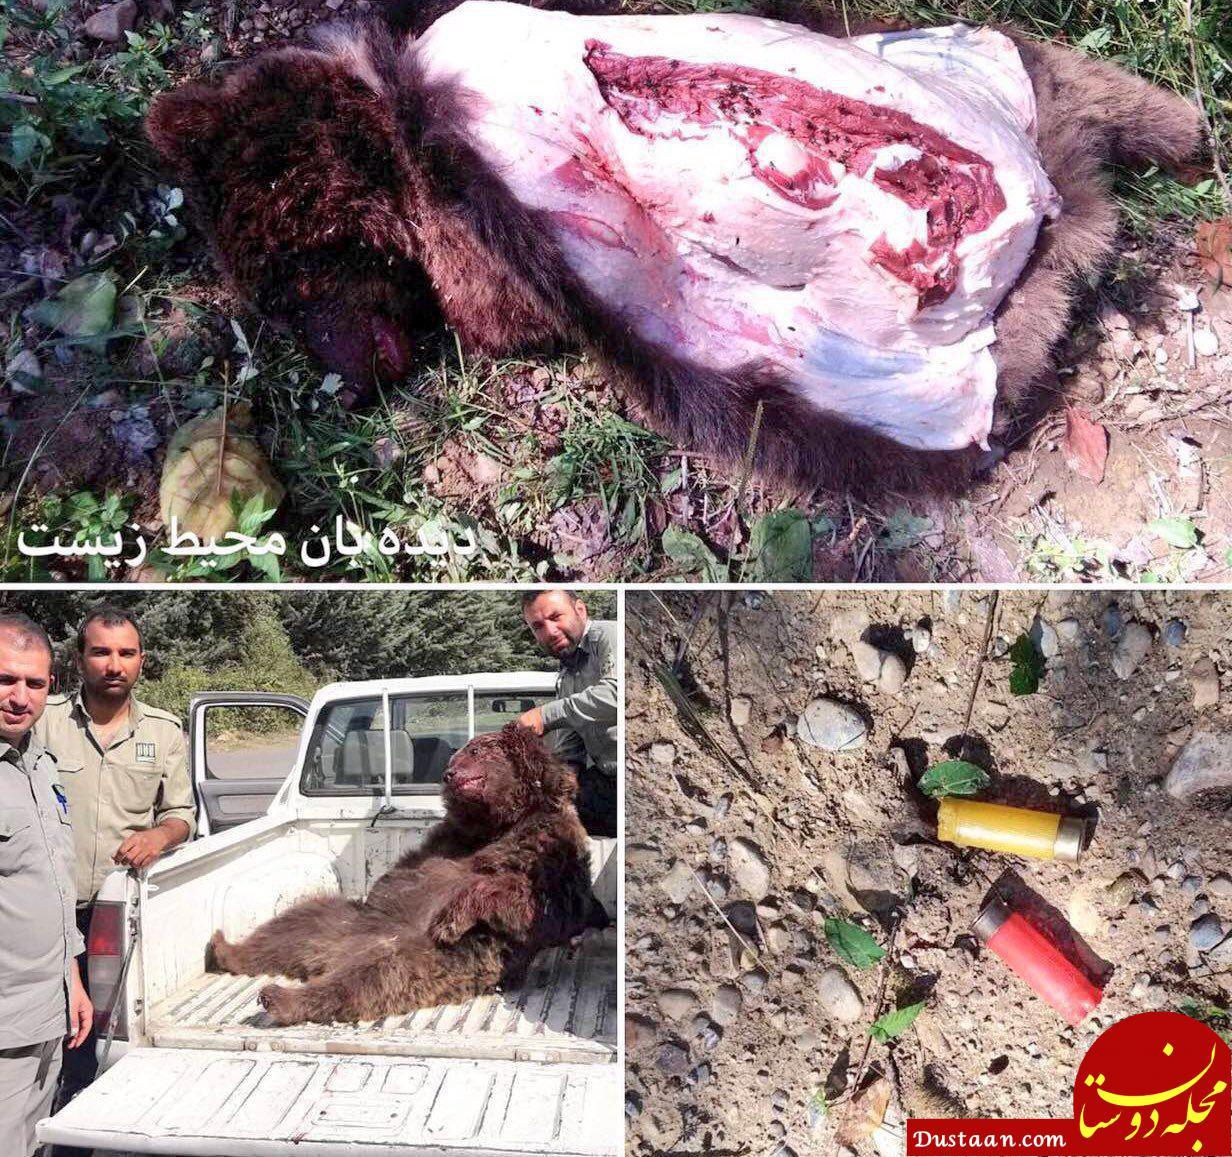 www.dustaan.com دستگیری چند نفر در حال تکه کردن این خرس برای کباب! +عکس